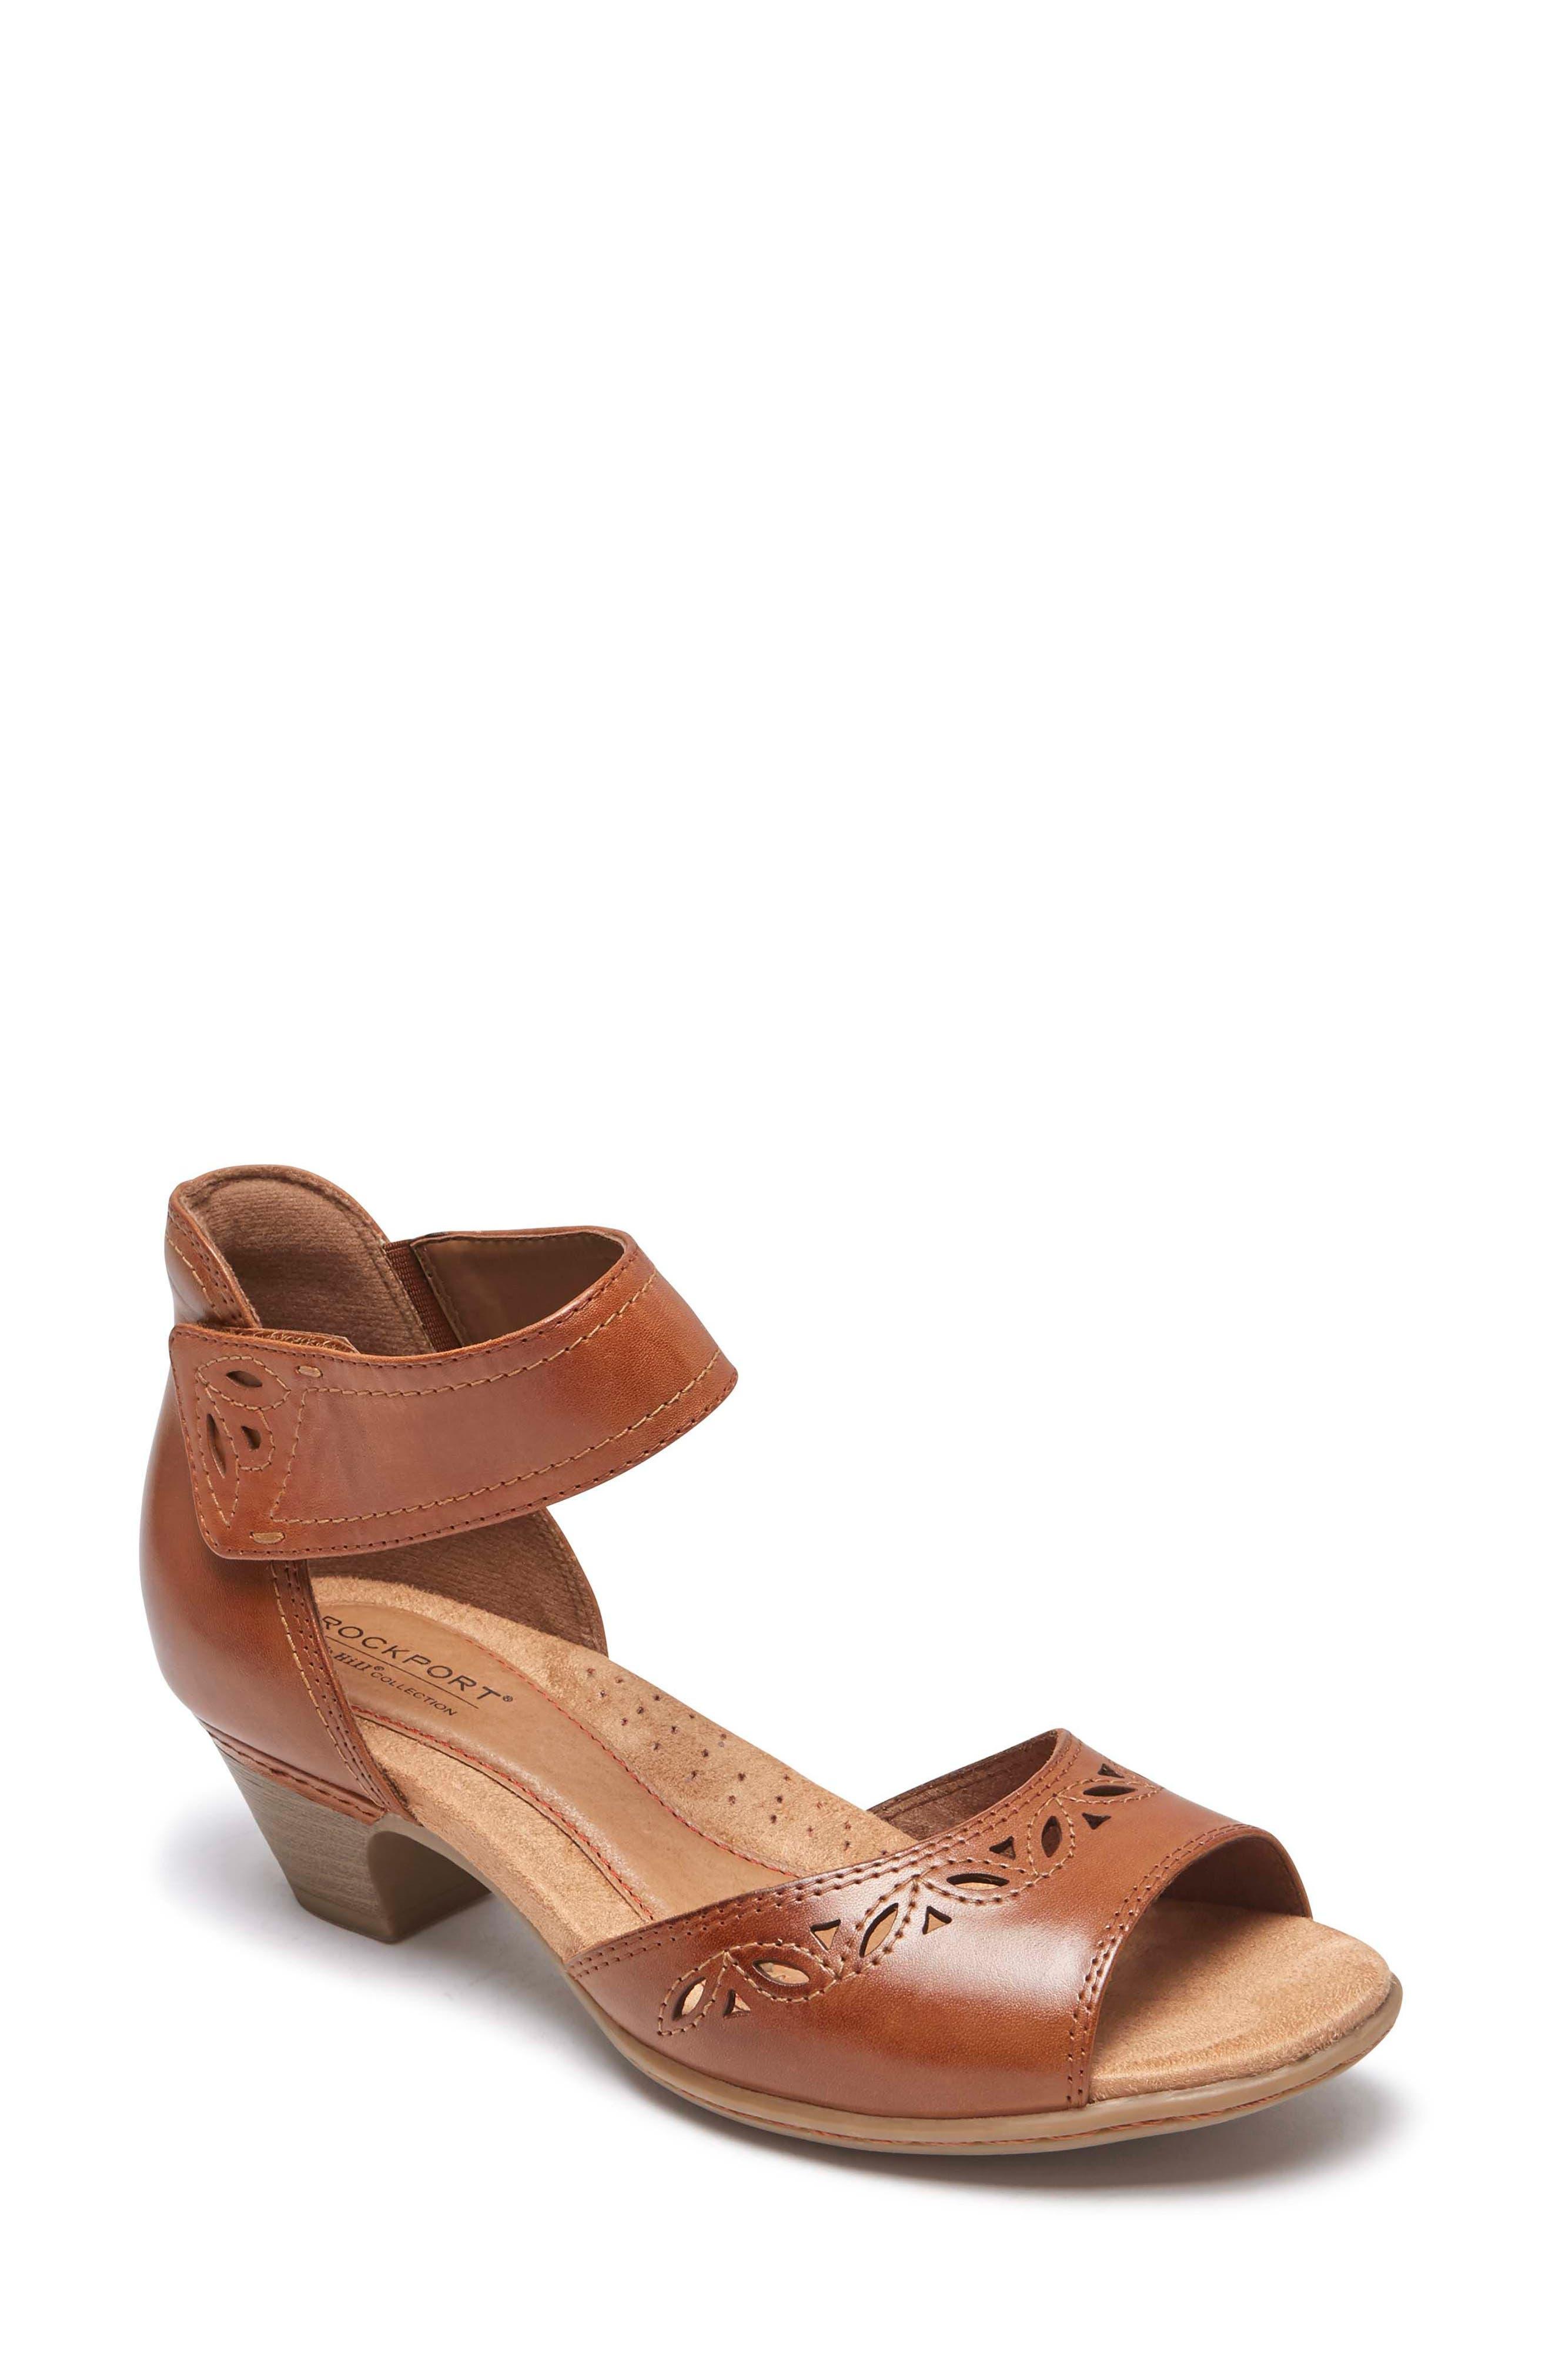 Rockport Cobb Hill Abbott Perforated Sandal (Women)